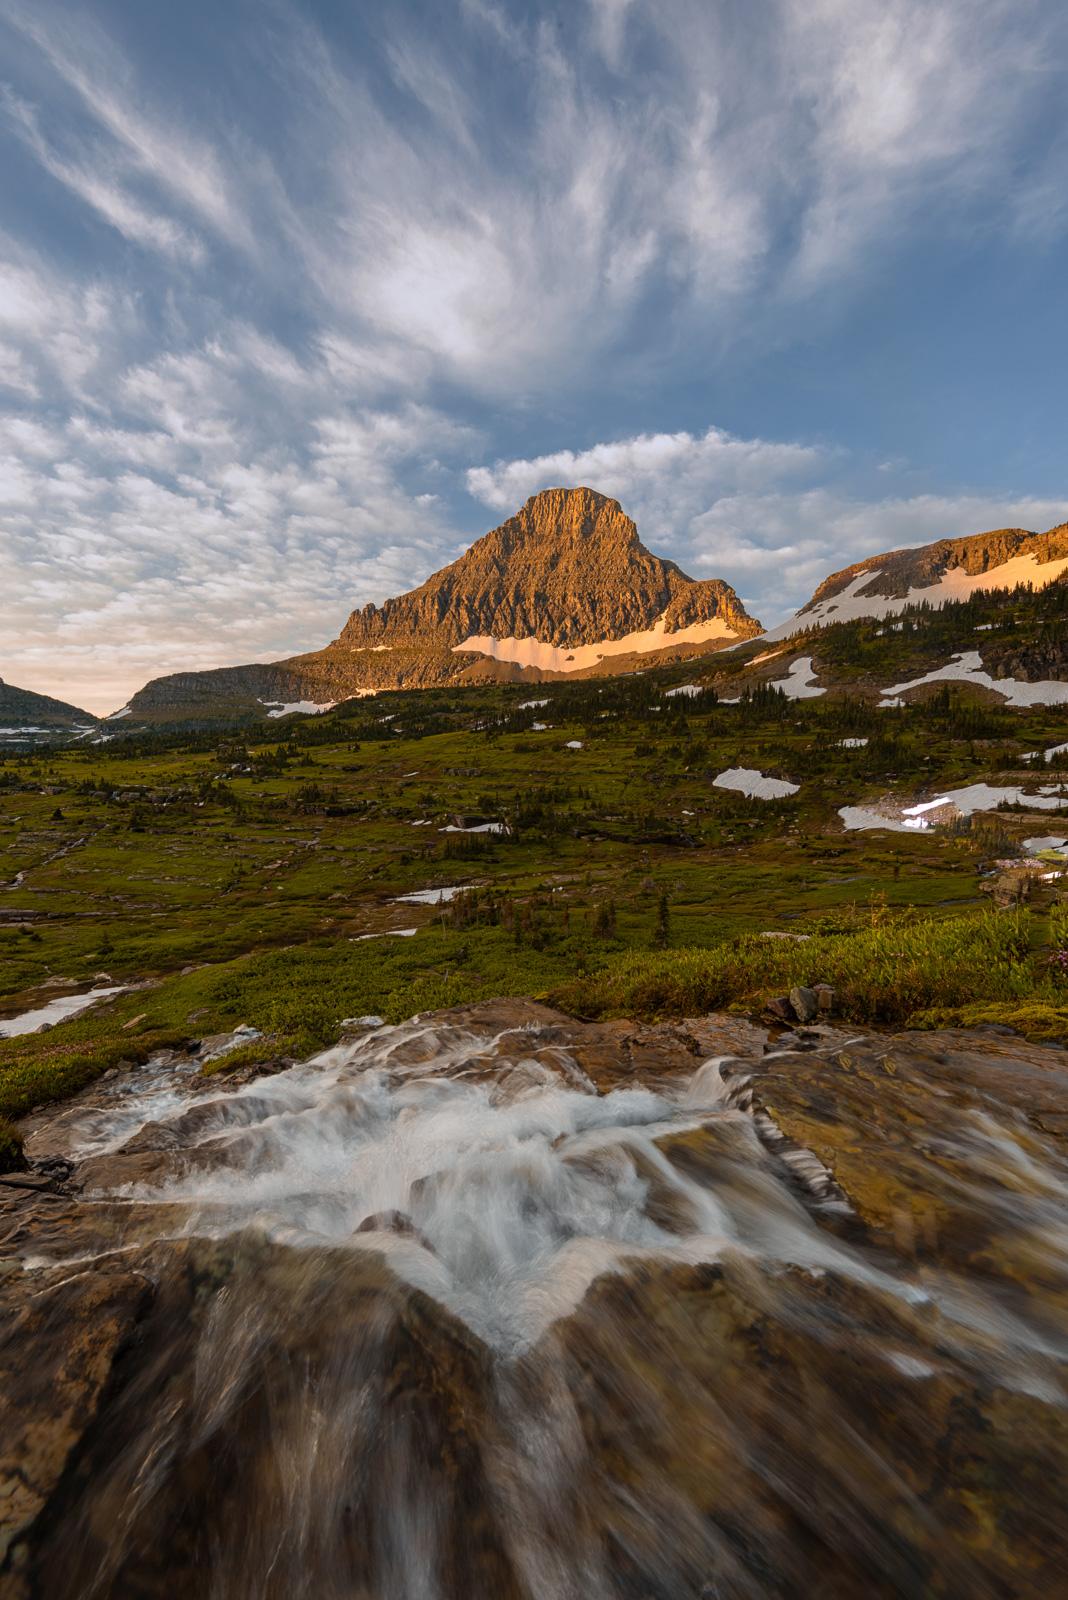 Reynolkds Mountain at sunrise from Logan Pass.